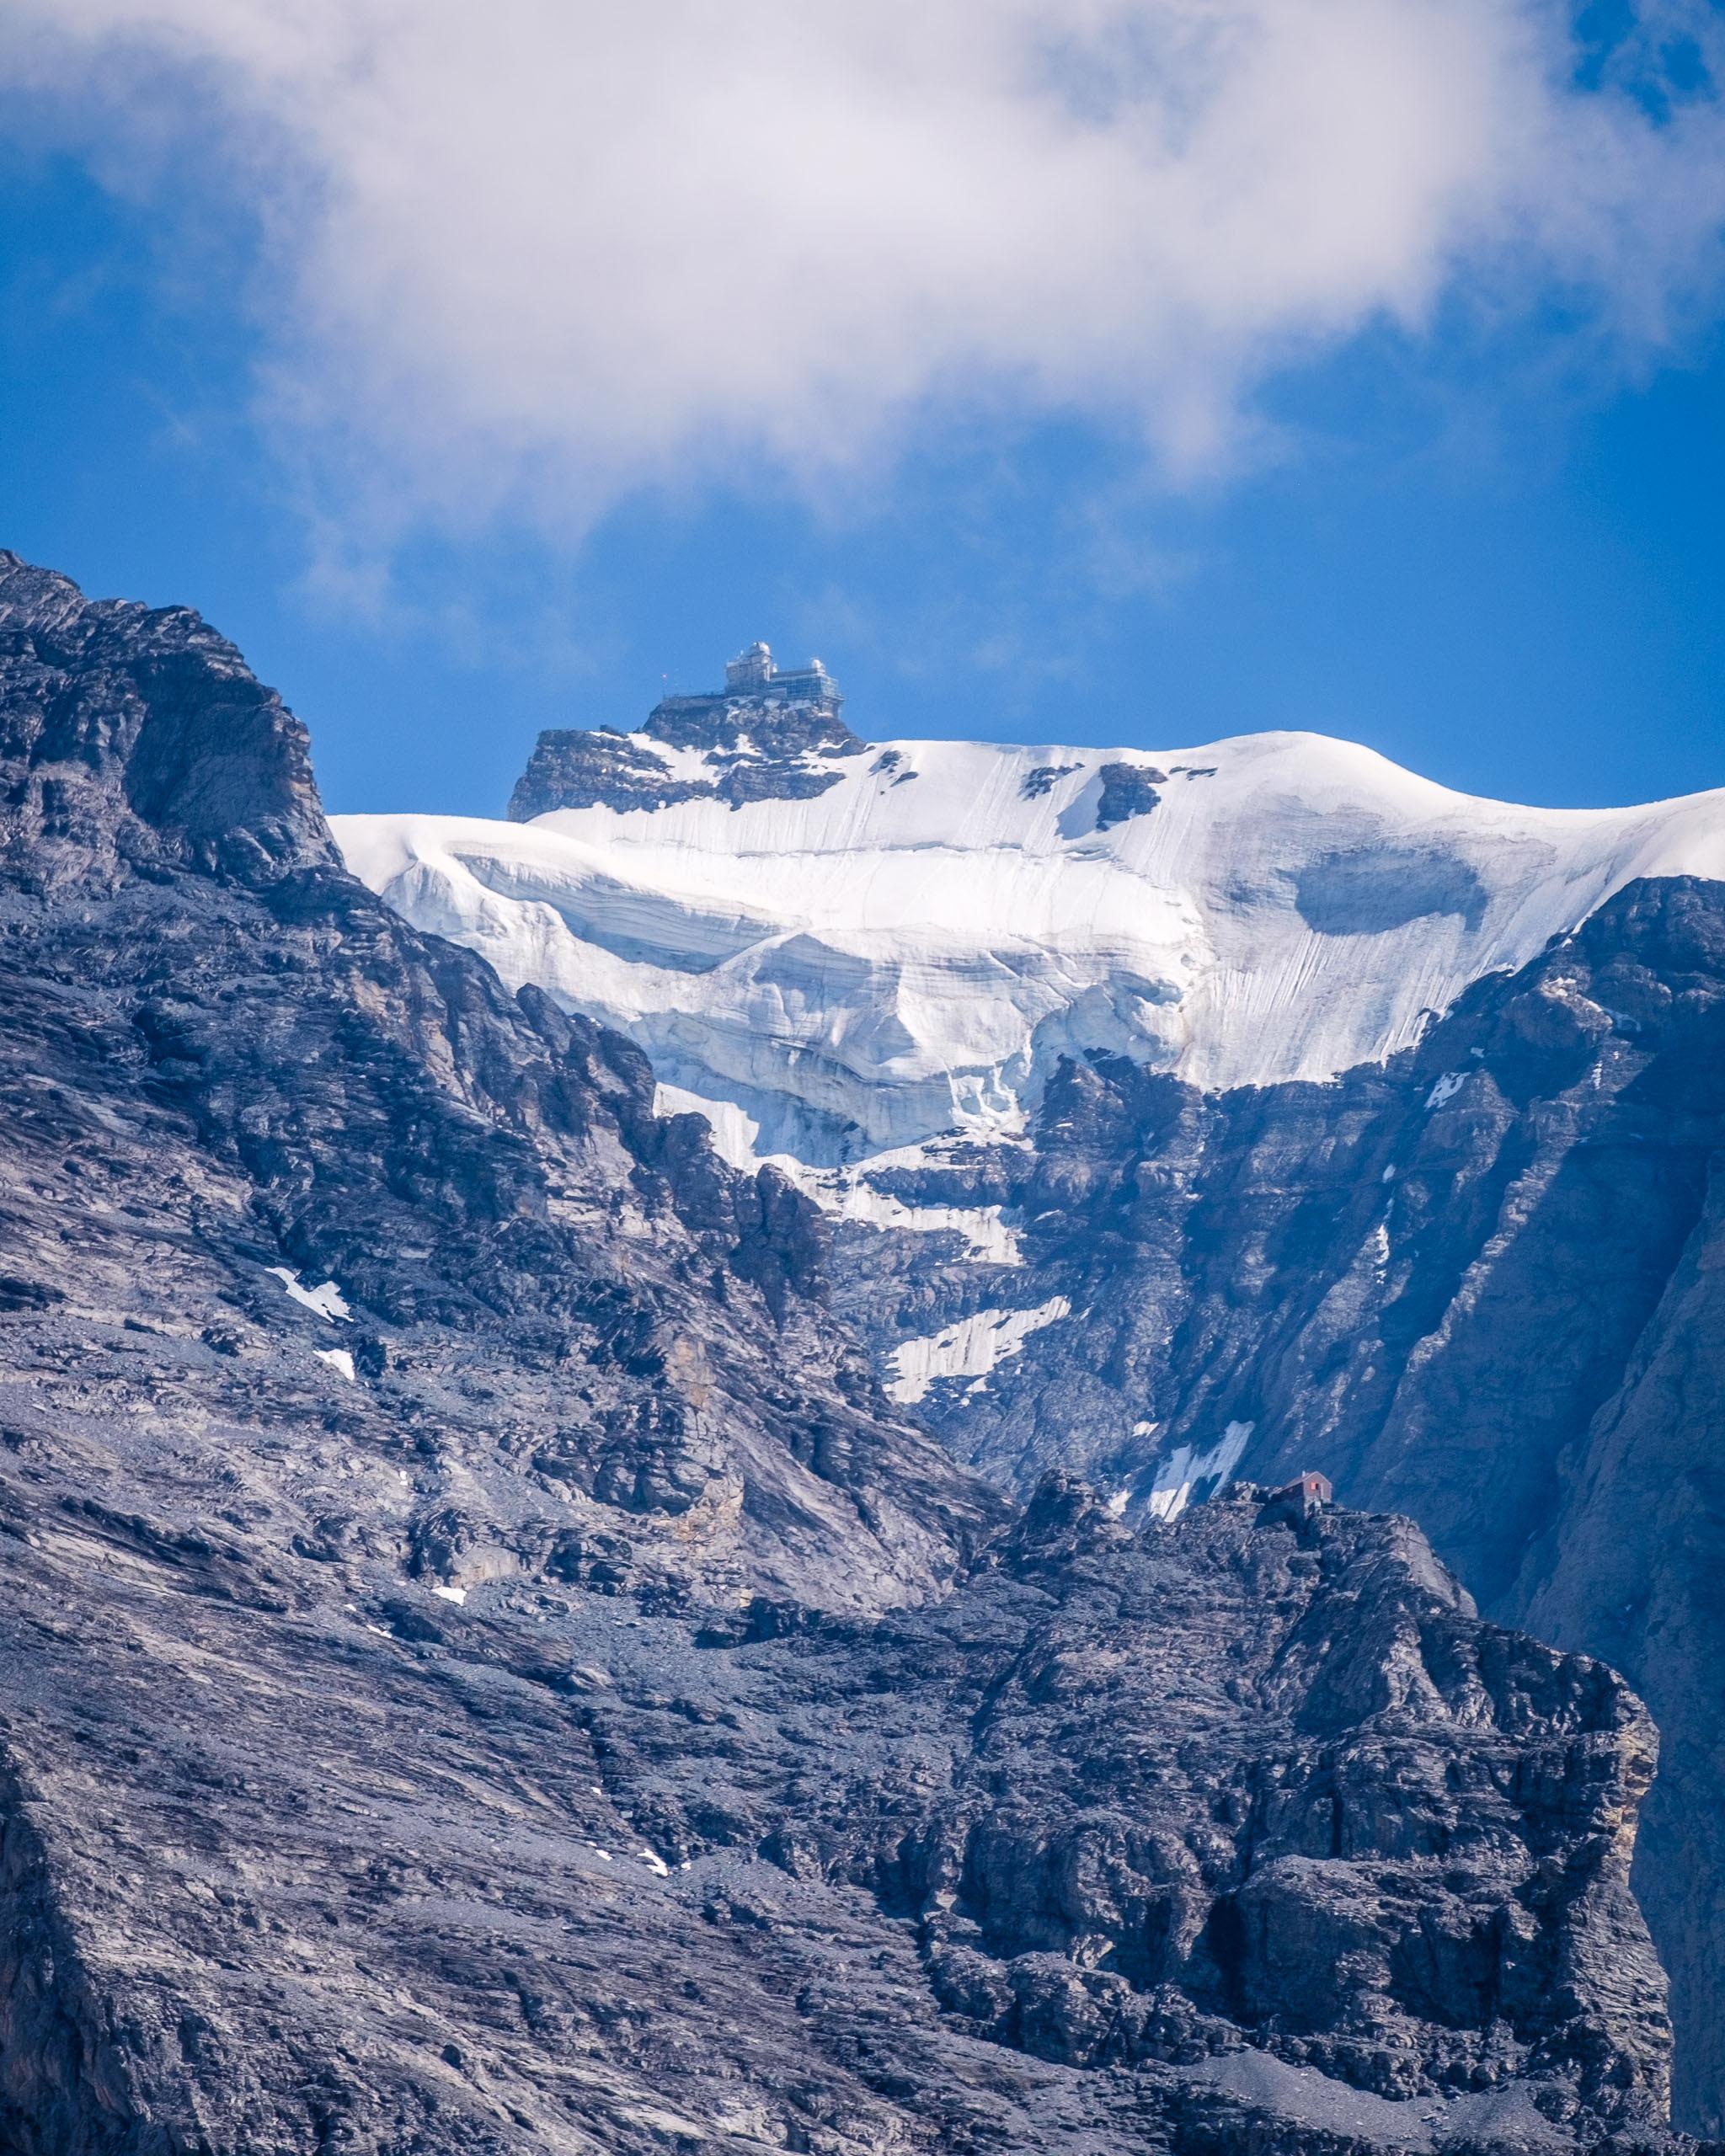 Jungfraujoch from Wengernalp